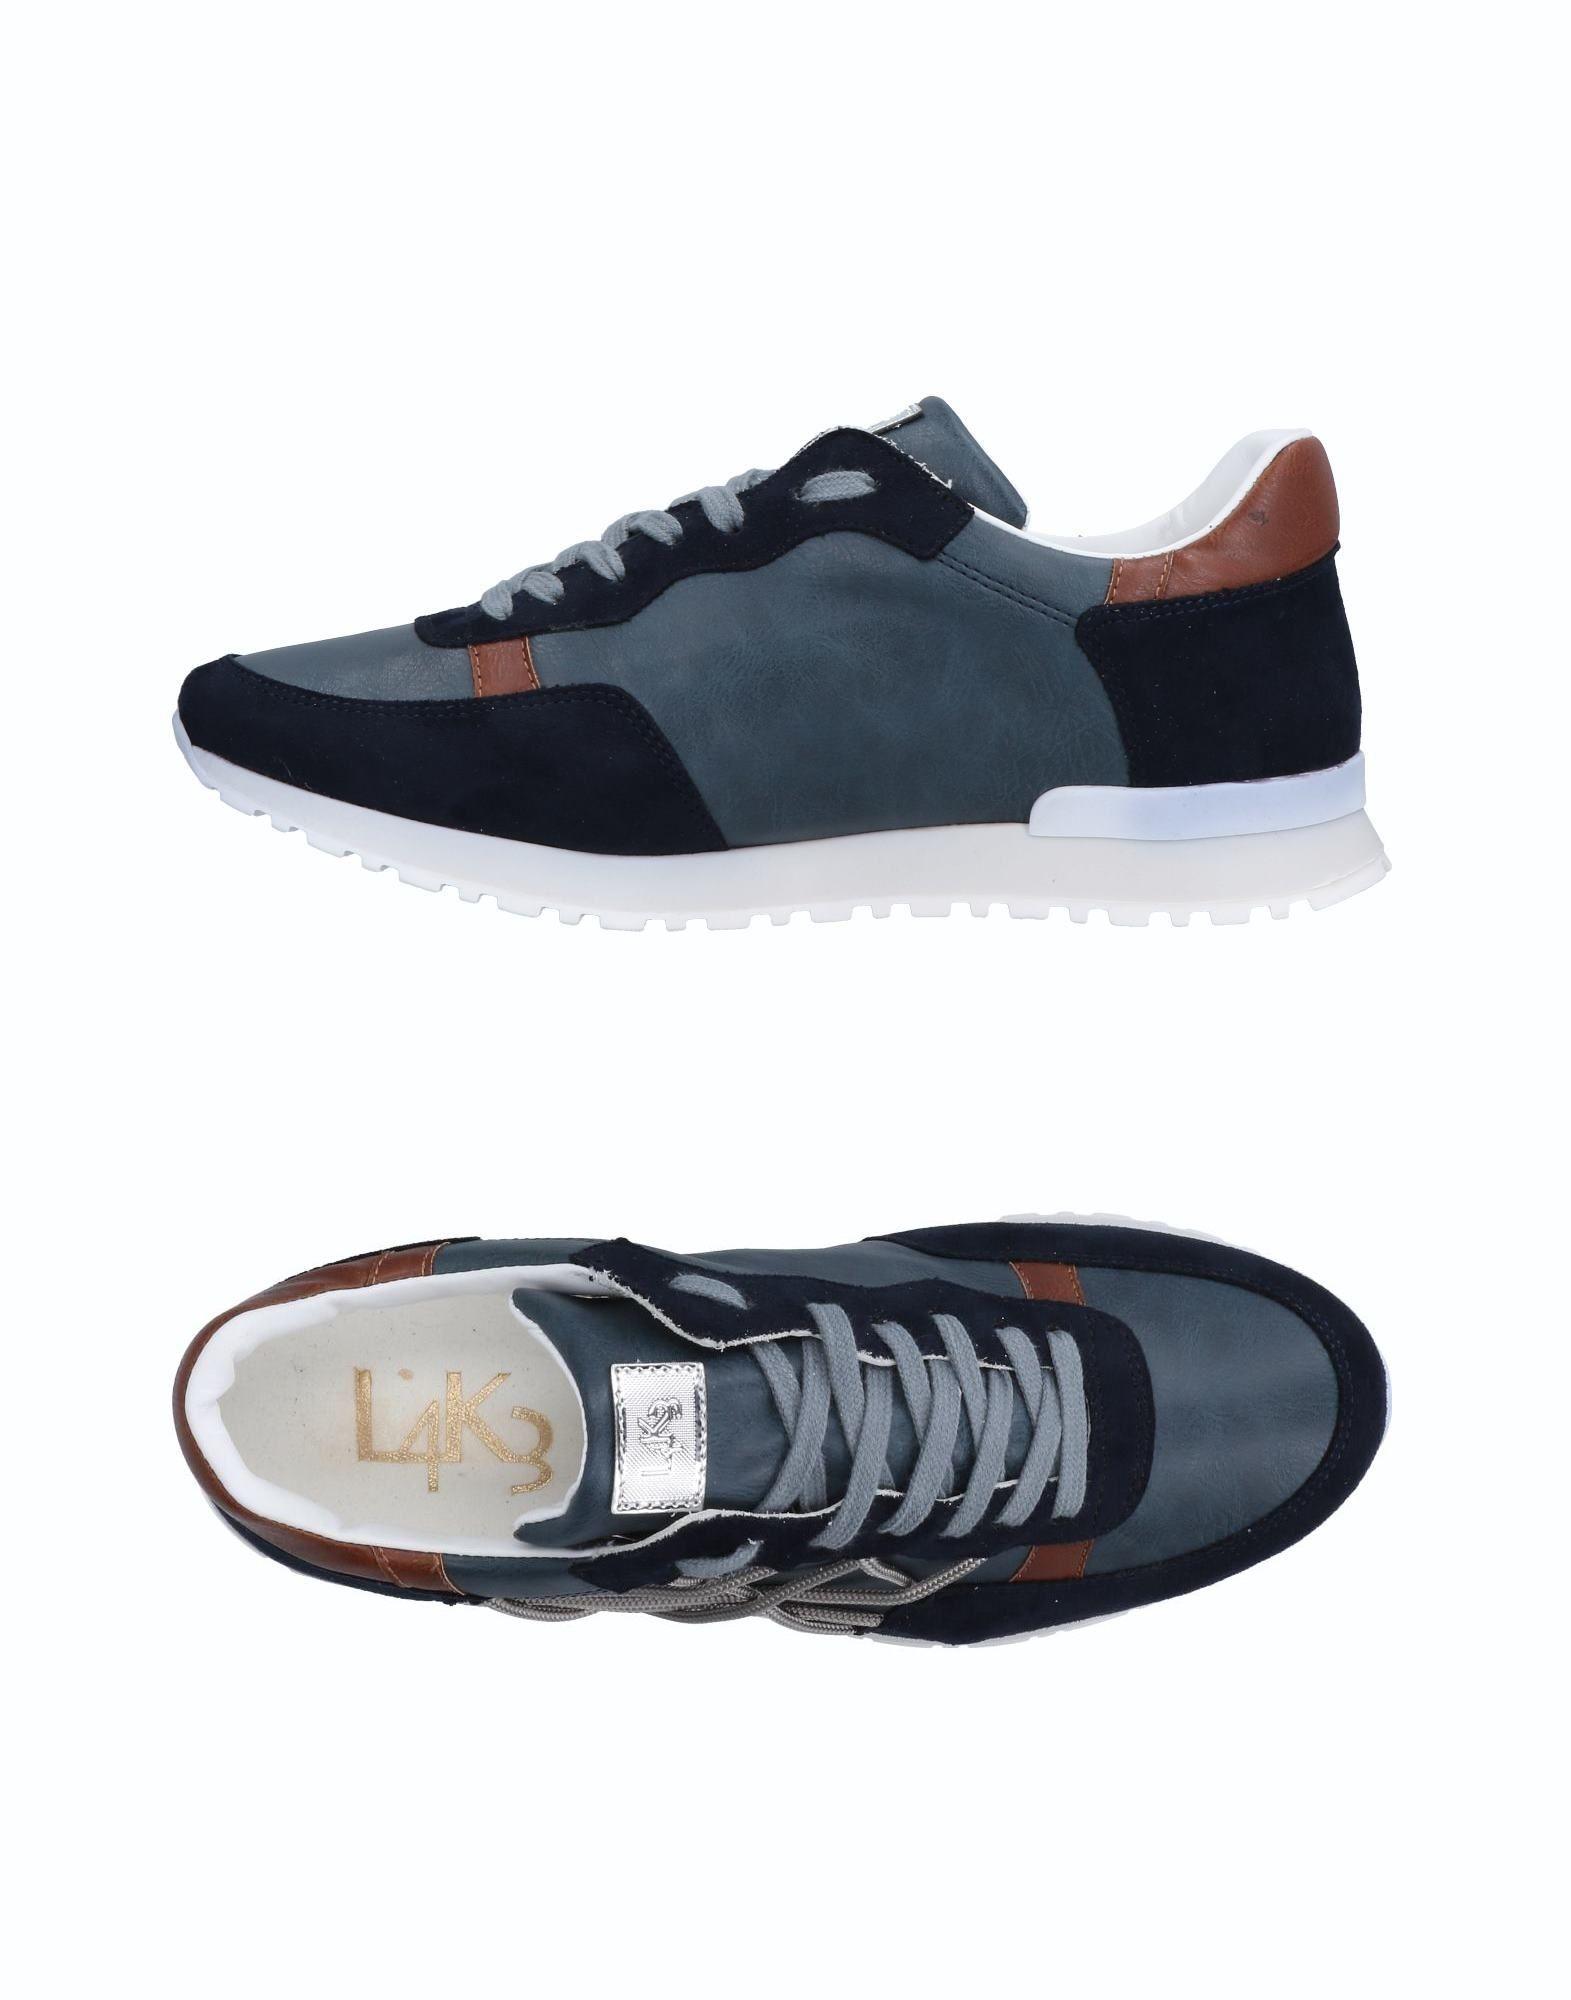 Moda Sneakers L4k3 Uomo - 11504707WW